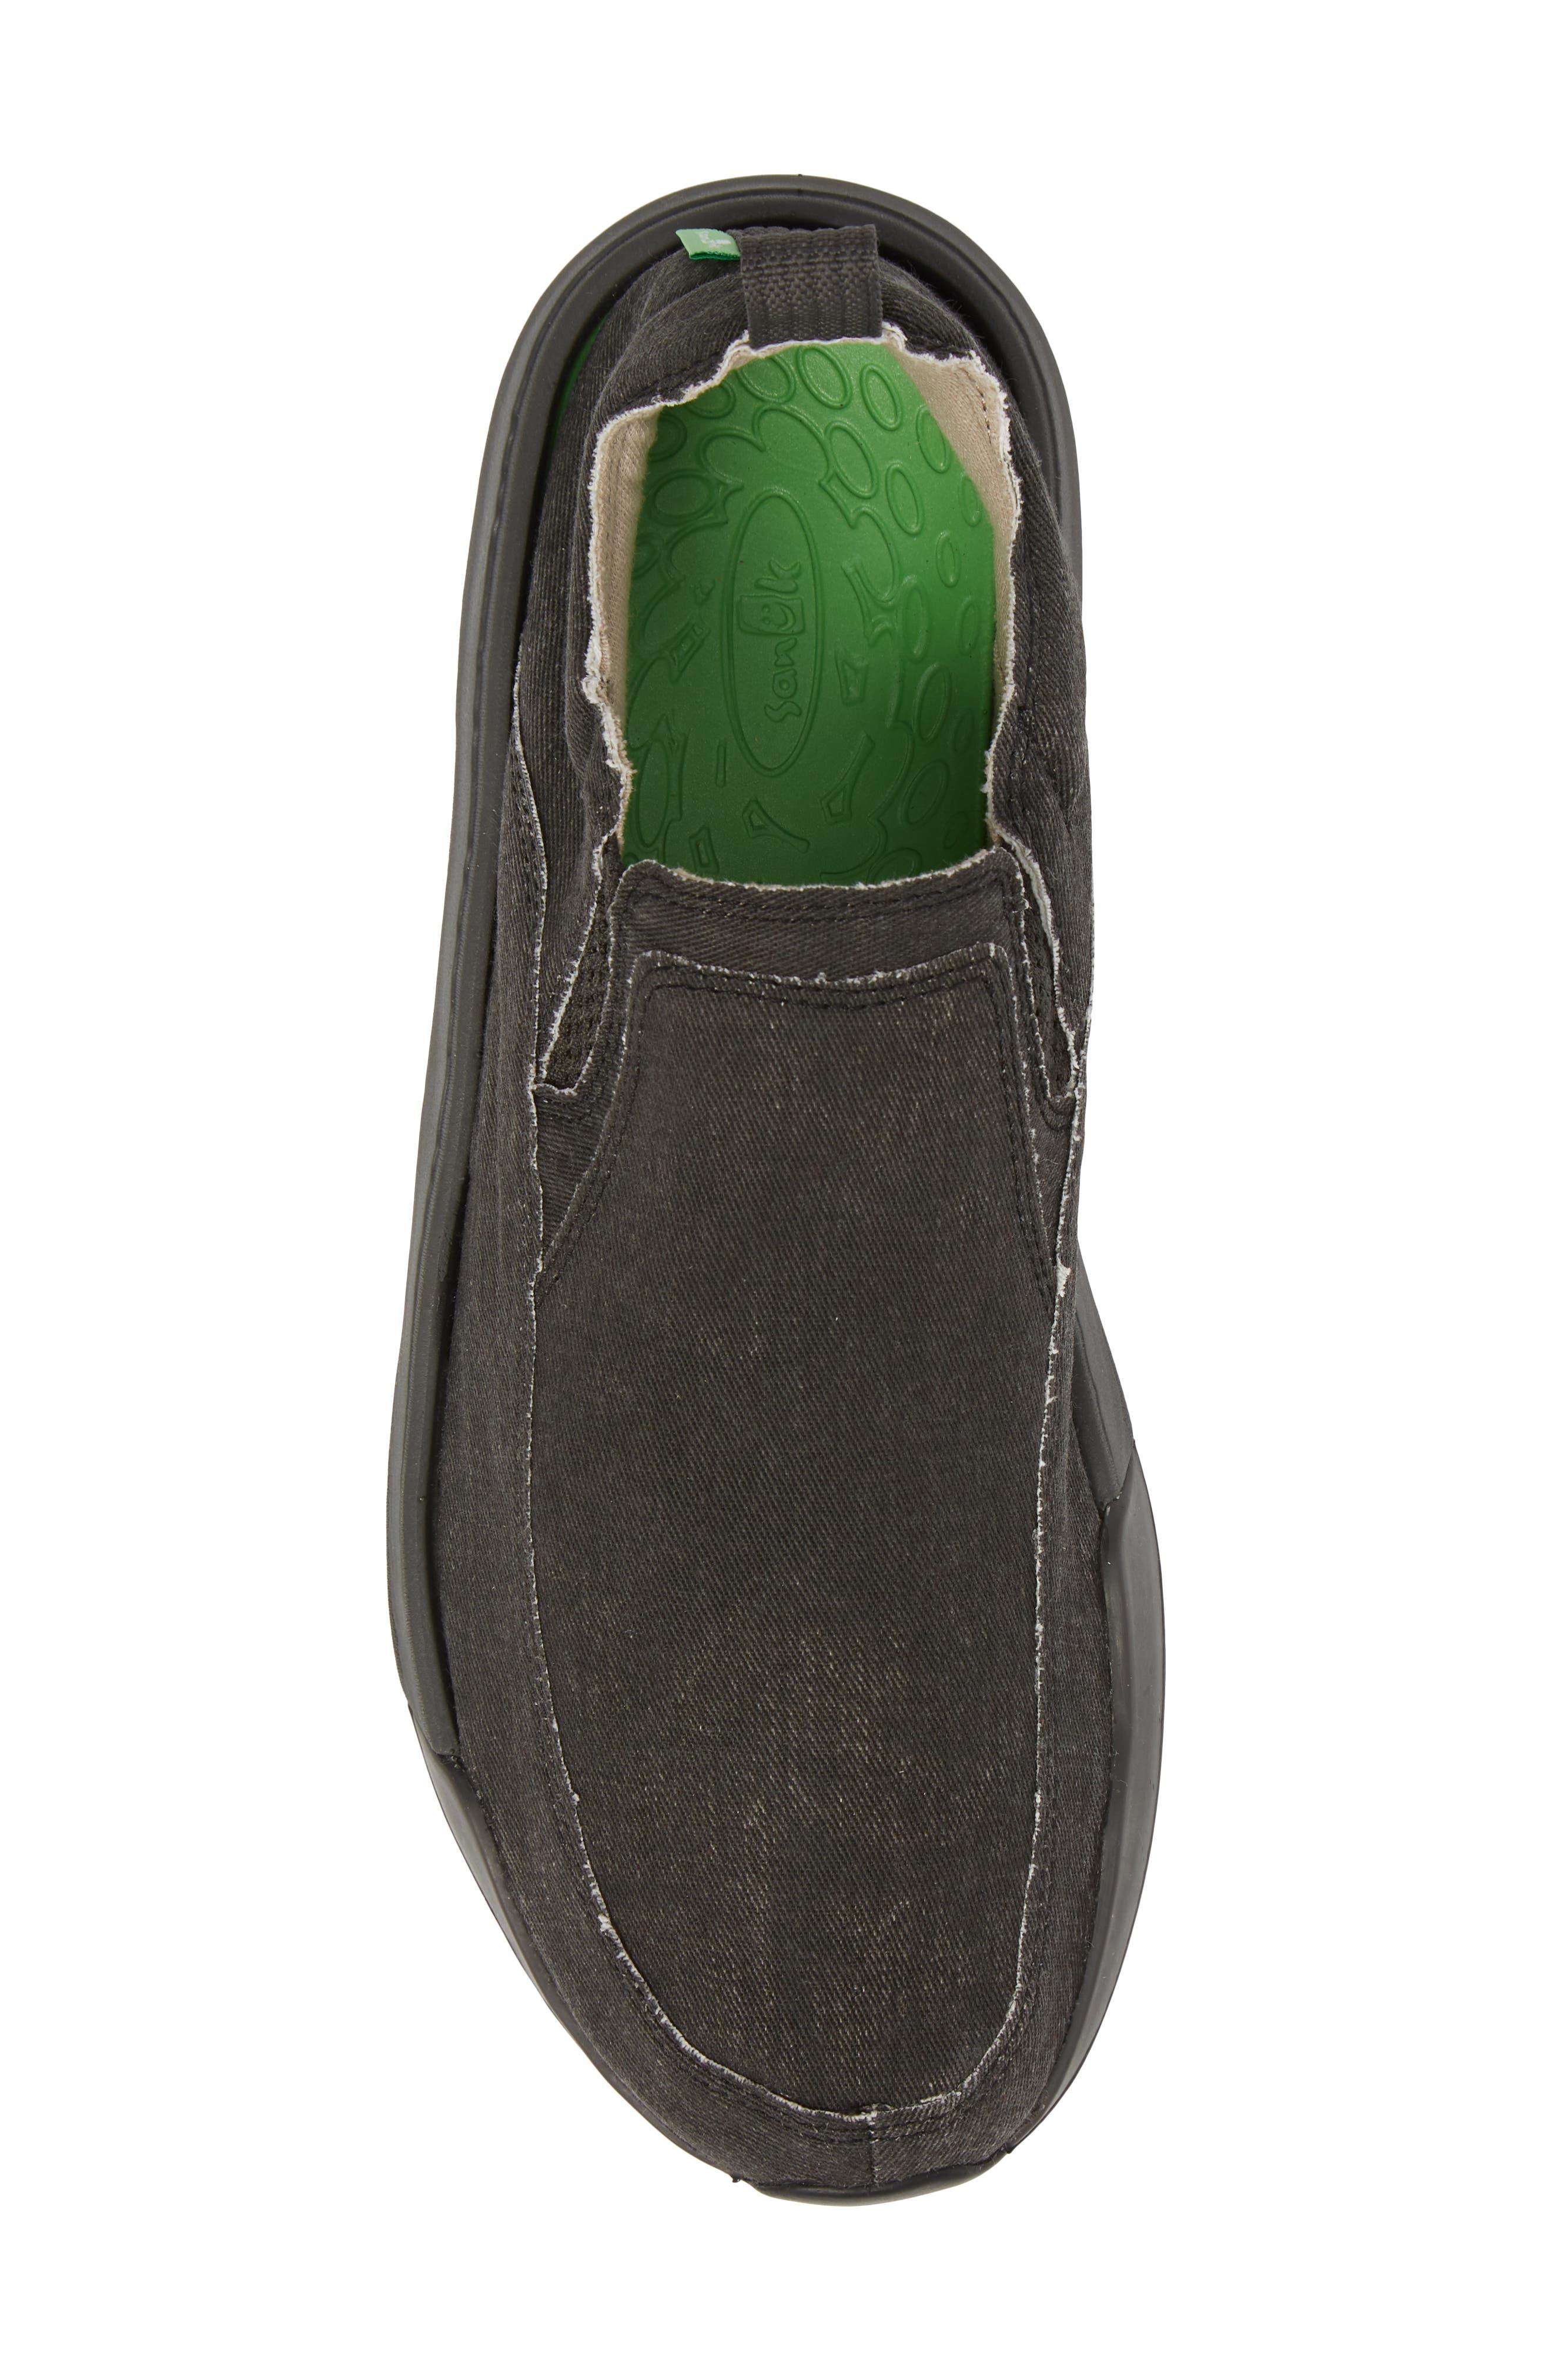 Chiba Quest Slip-On Sneaker,                             Alternate thumbnail 4, color,                             Black/ Black